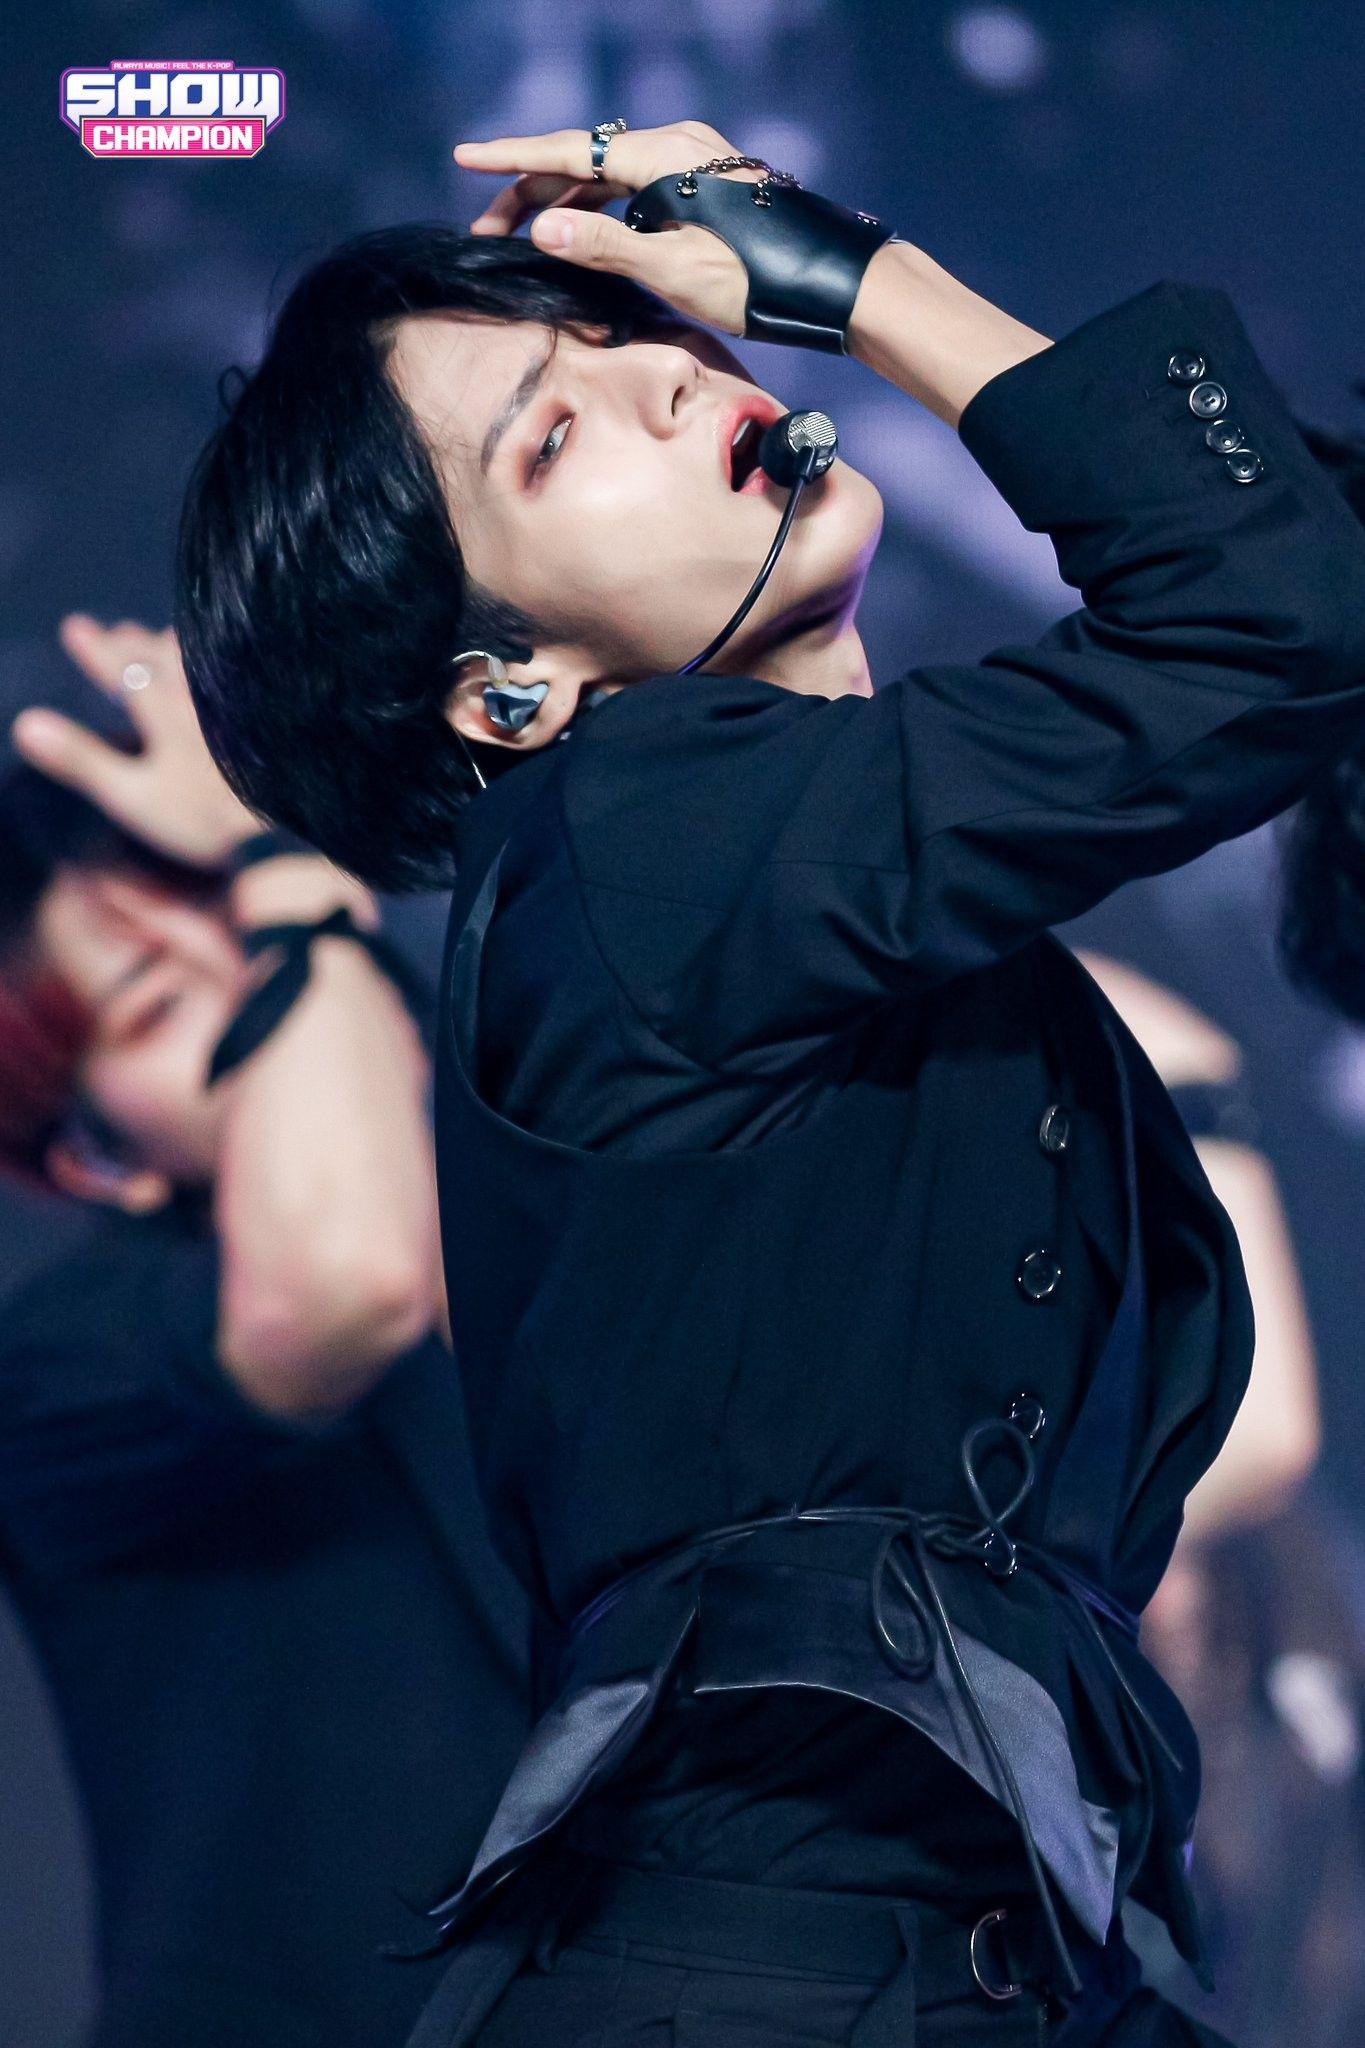 Pin By Maryann Kumari On Ateez In 2020 Woo Young Jung Woo Young Asian Boy Band